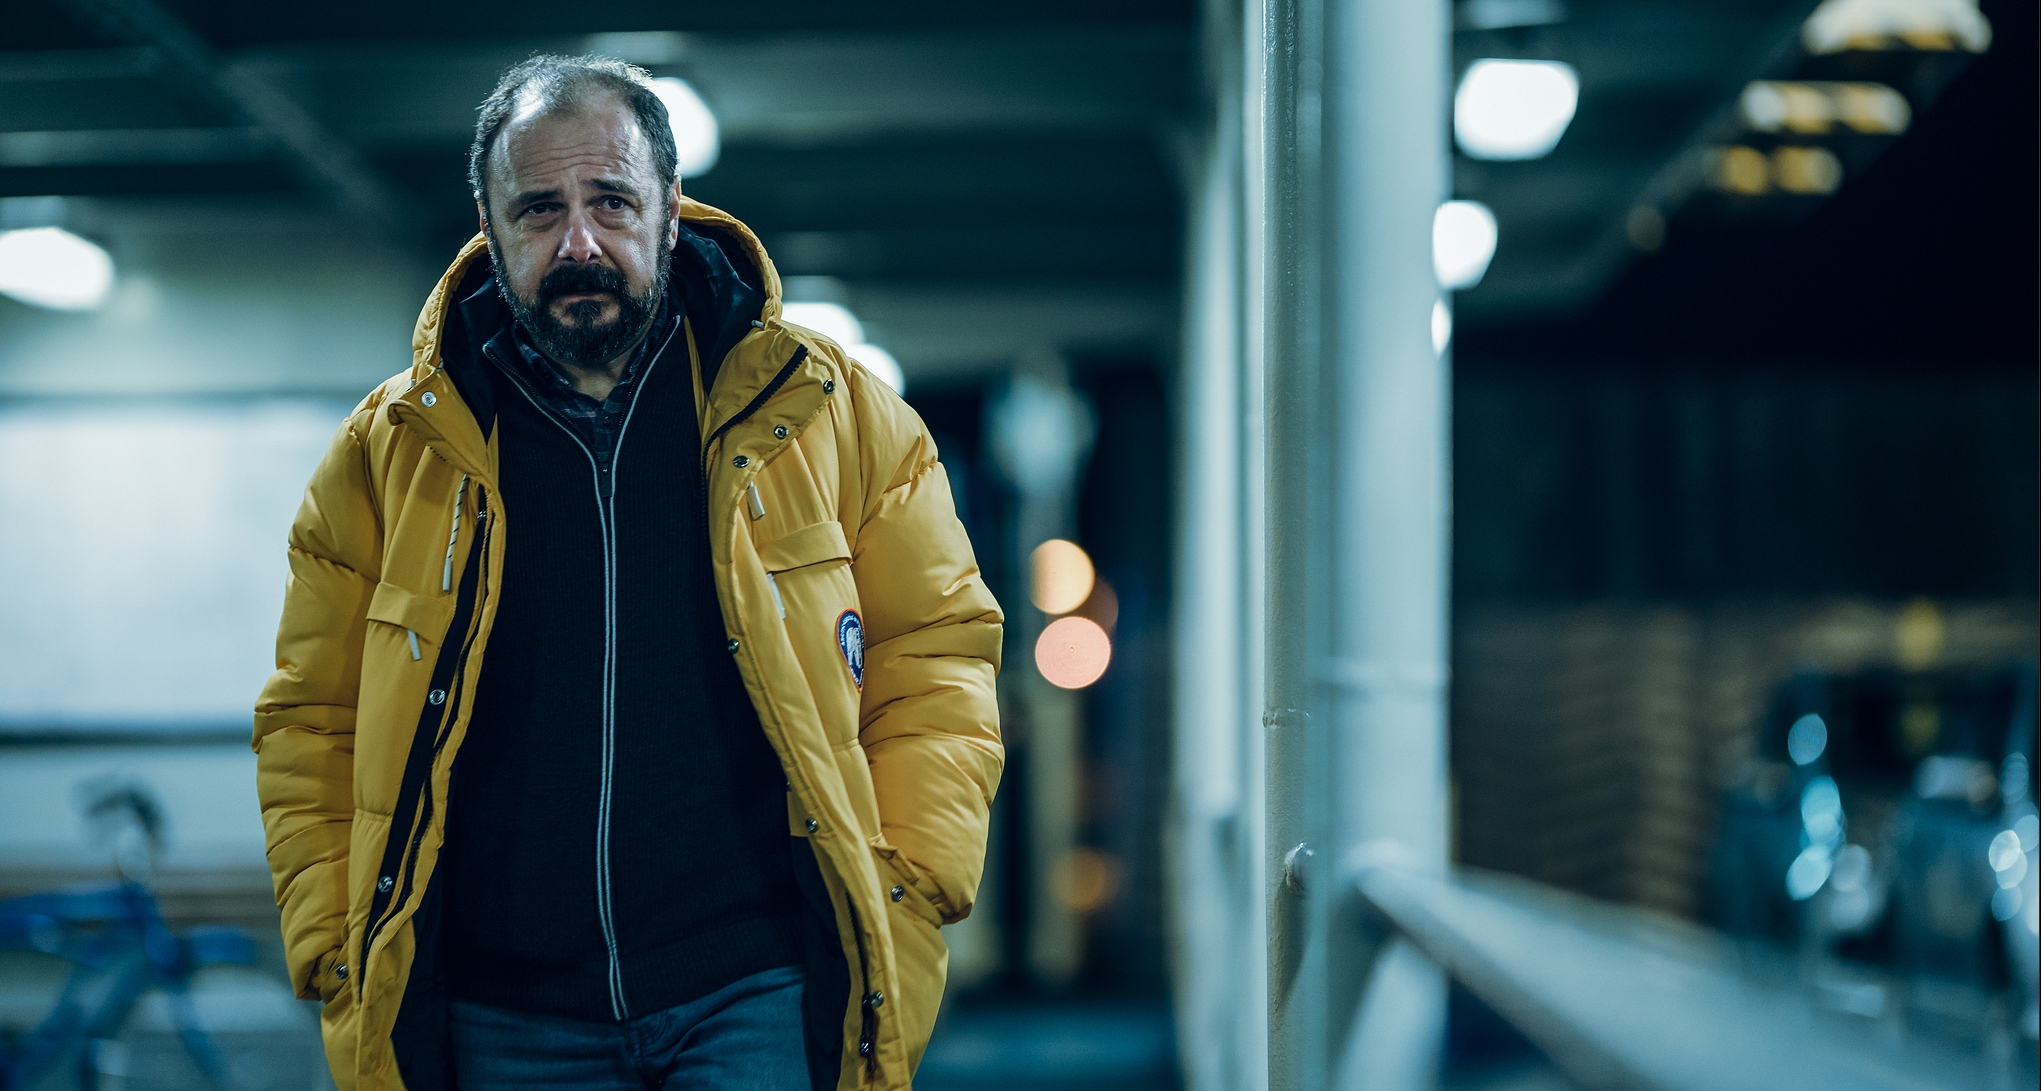 Klangor serial finał recenzja opinie